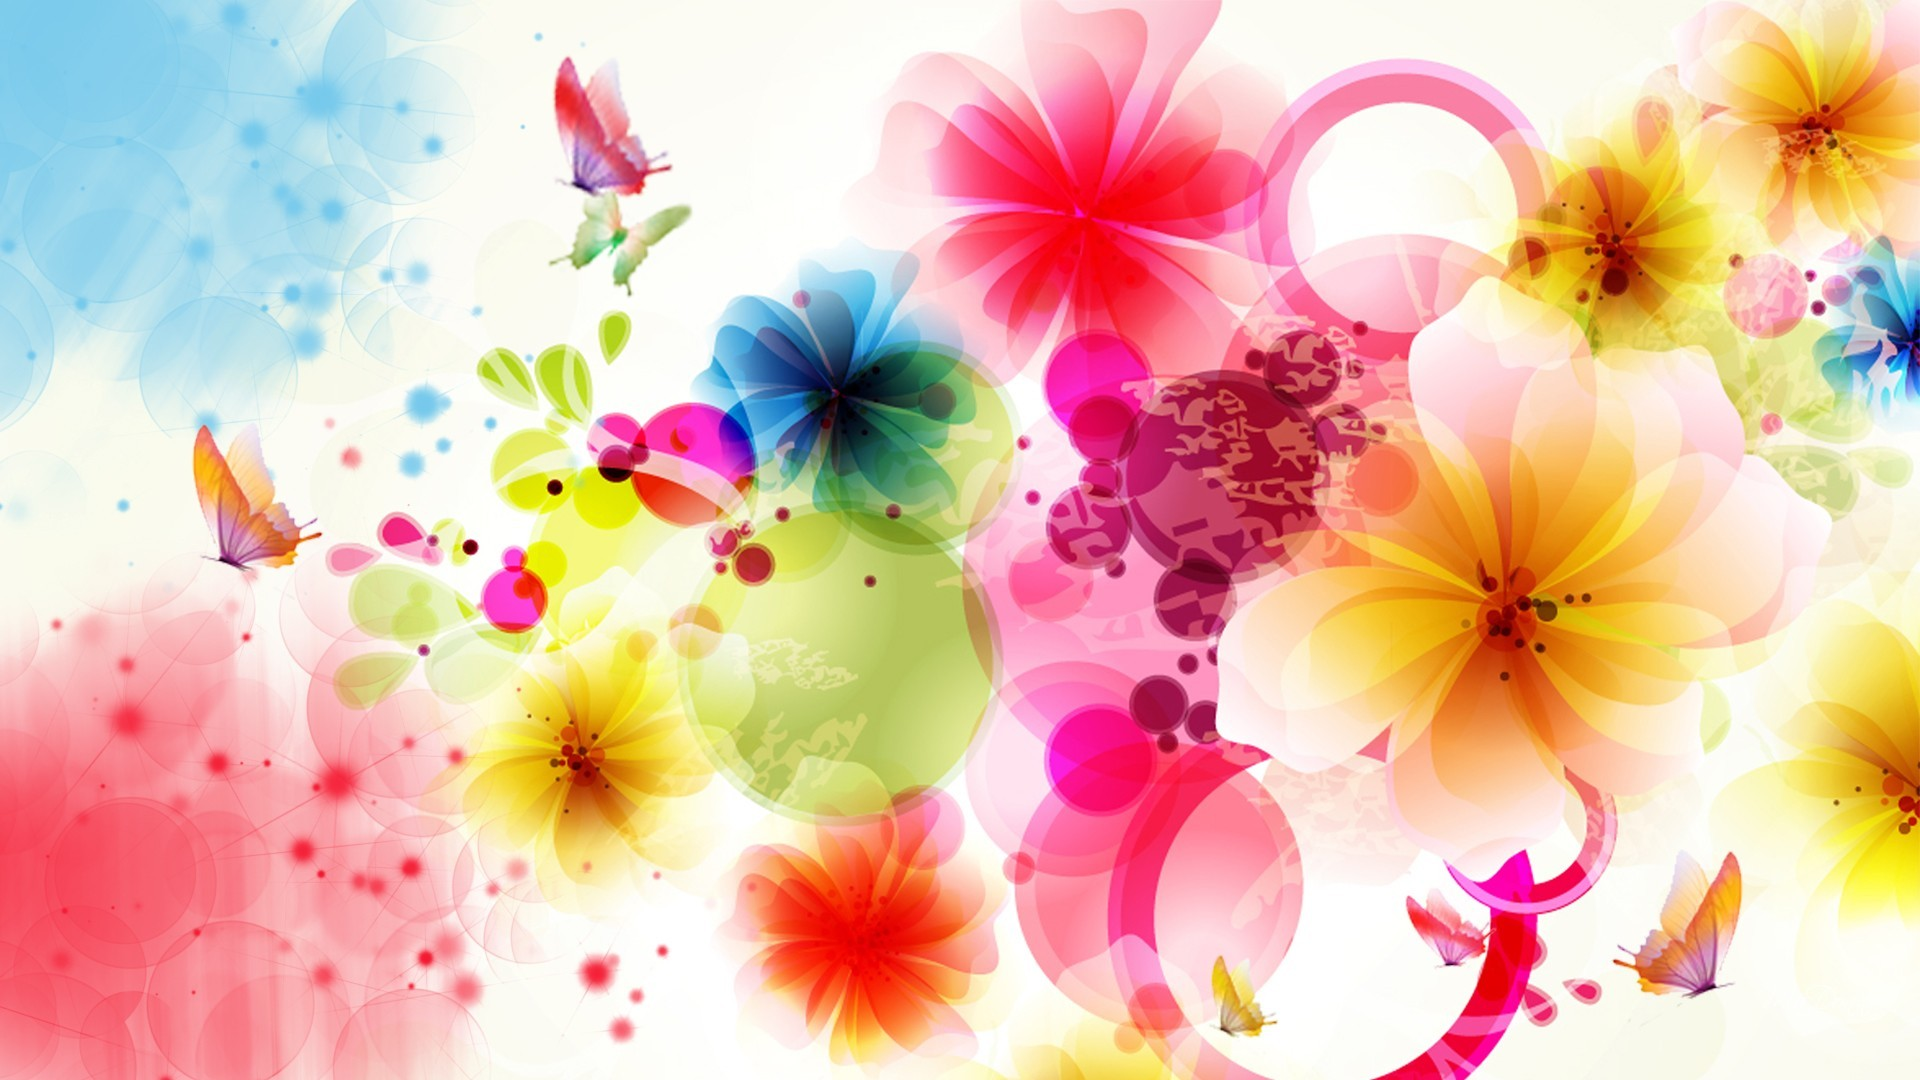 Floral Wallpaper 1920x1080 66420